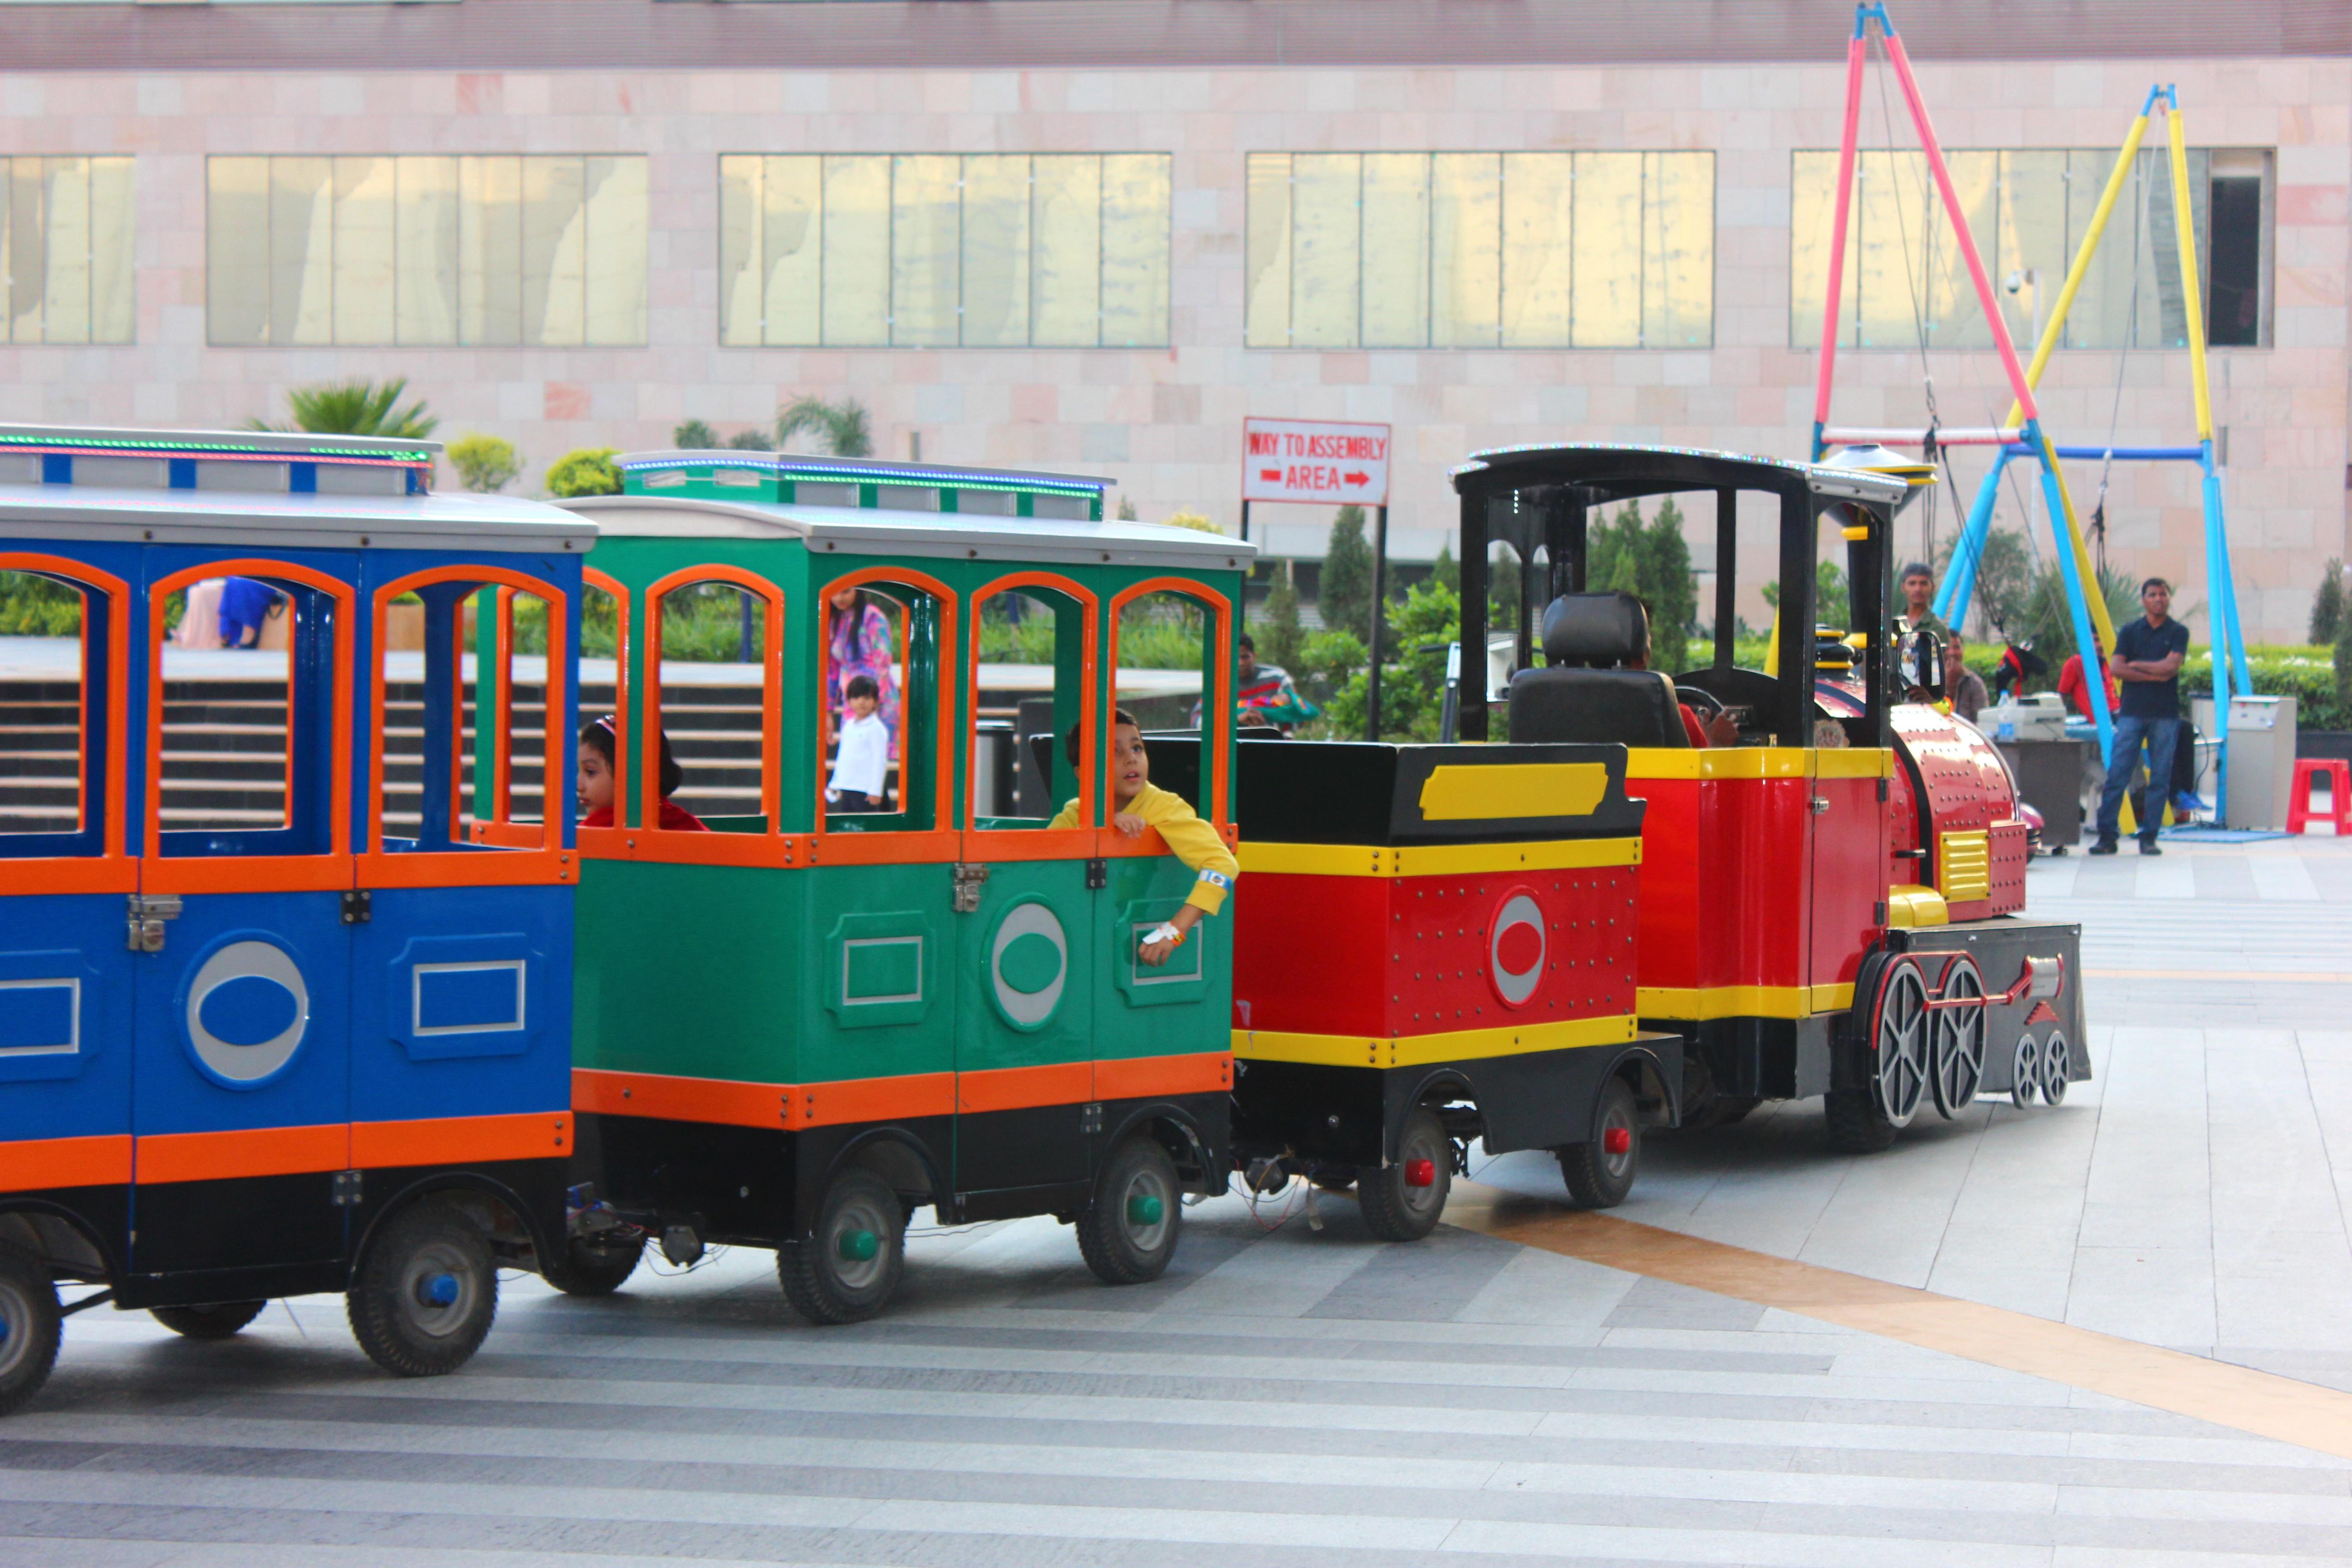 Free Images : Railway, Railroad, Car, Play, Floor, Boy